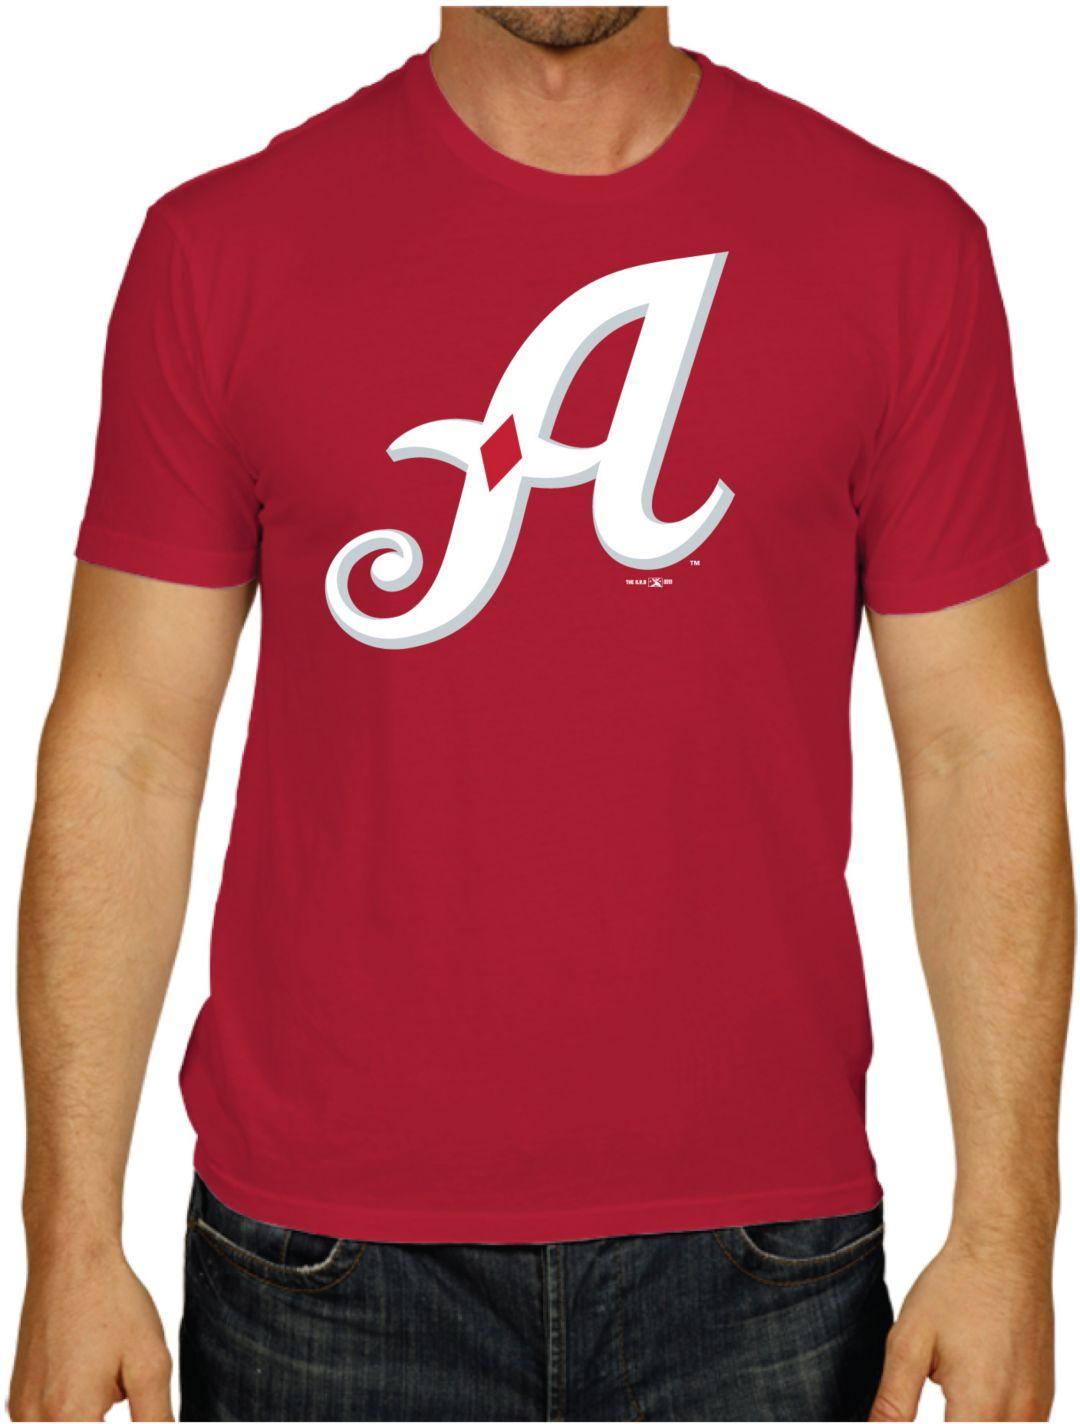 The Victory Men's Reno Aces T-Shirt